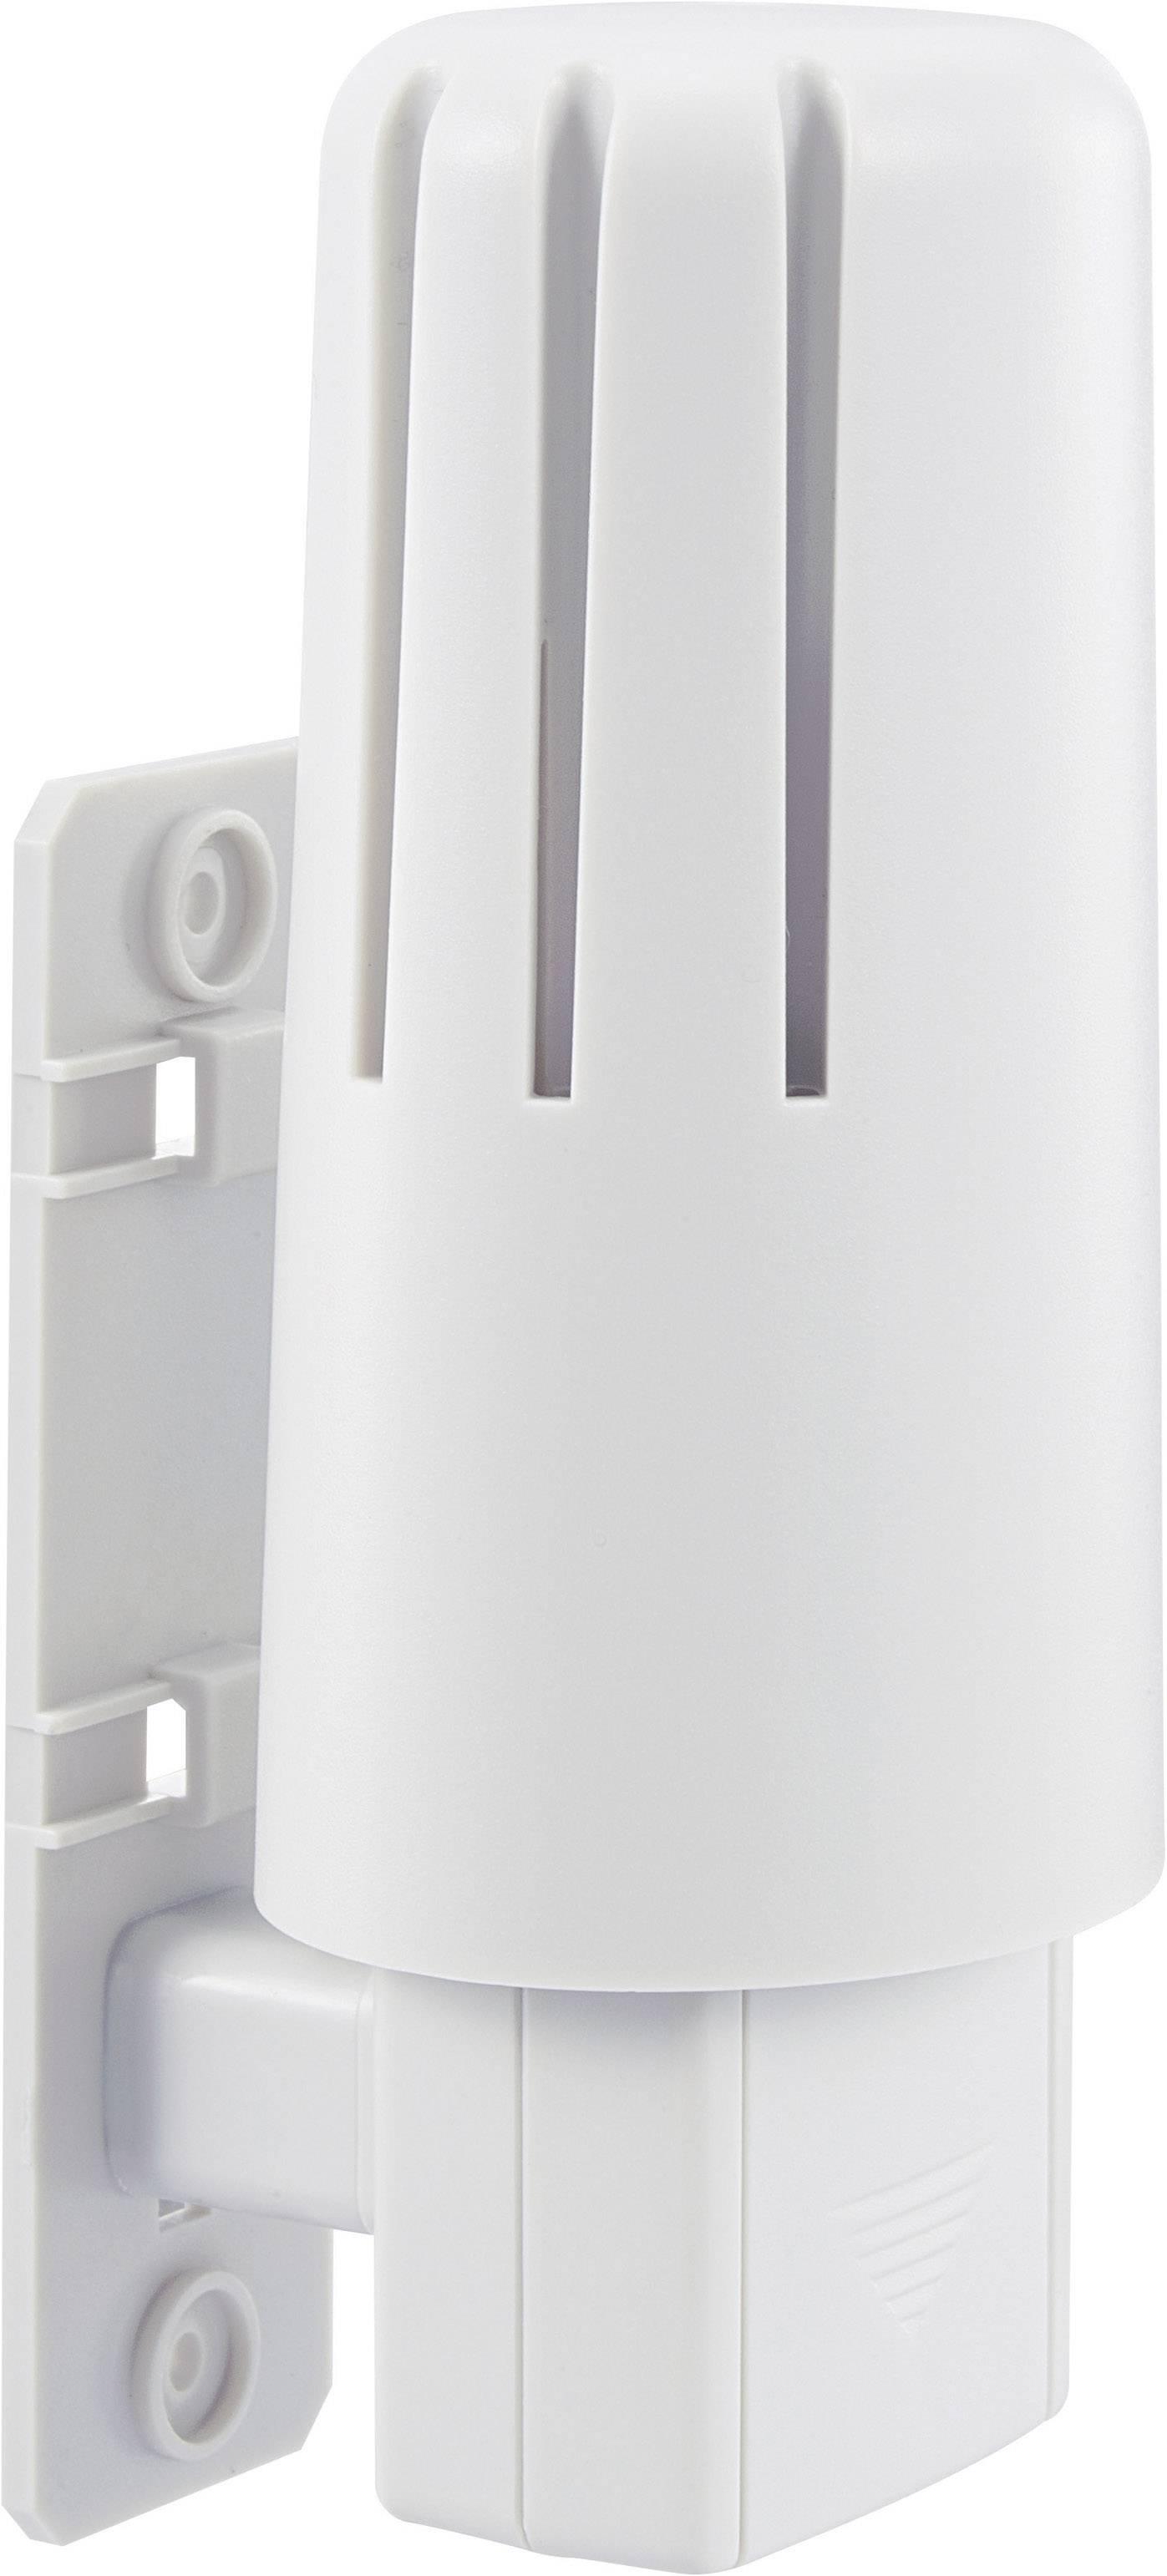 Venkovní senzor teploty/vlhkosti TX21IT+